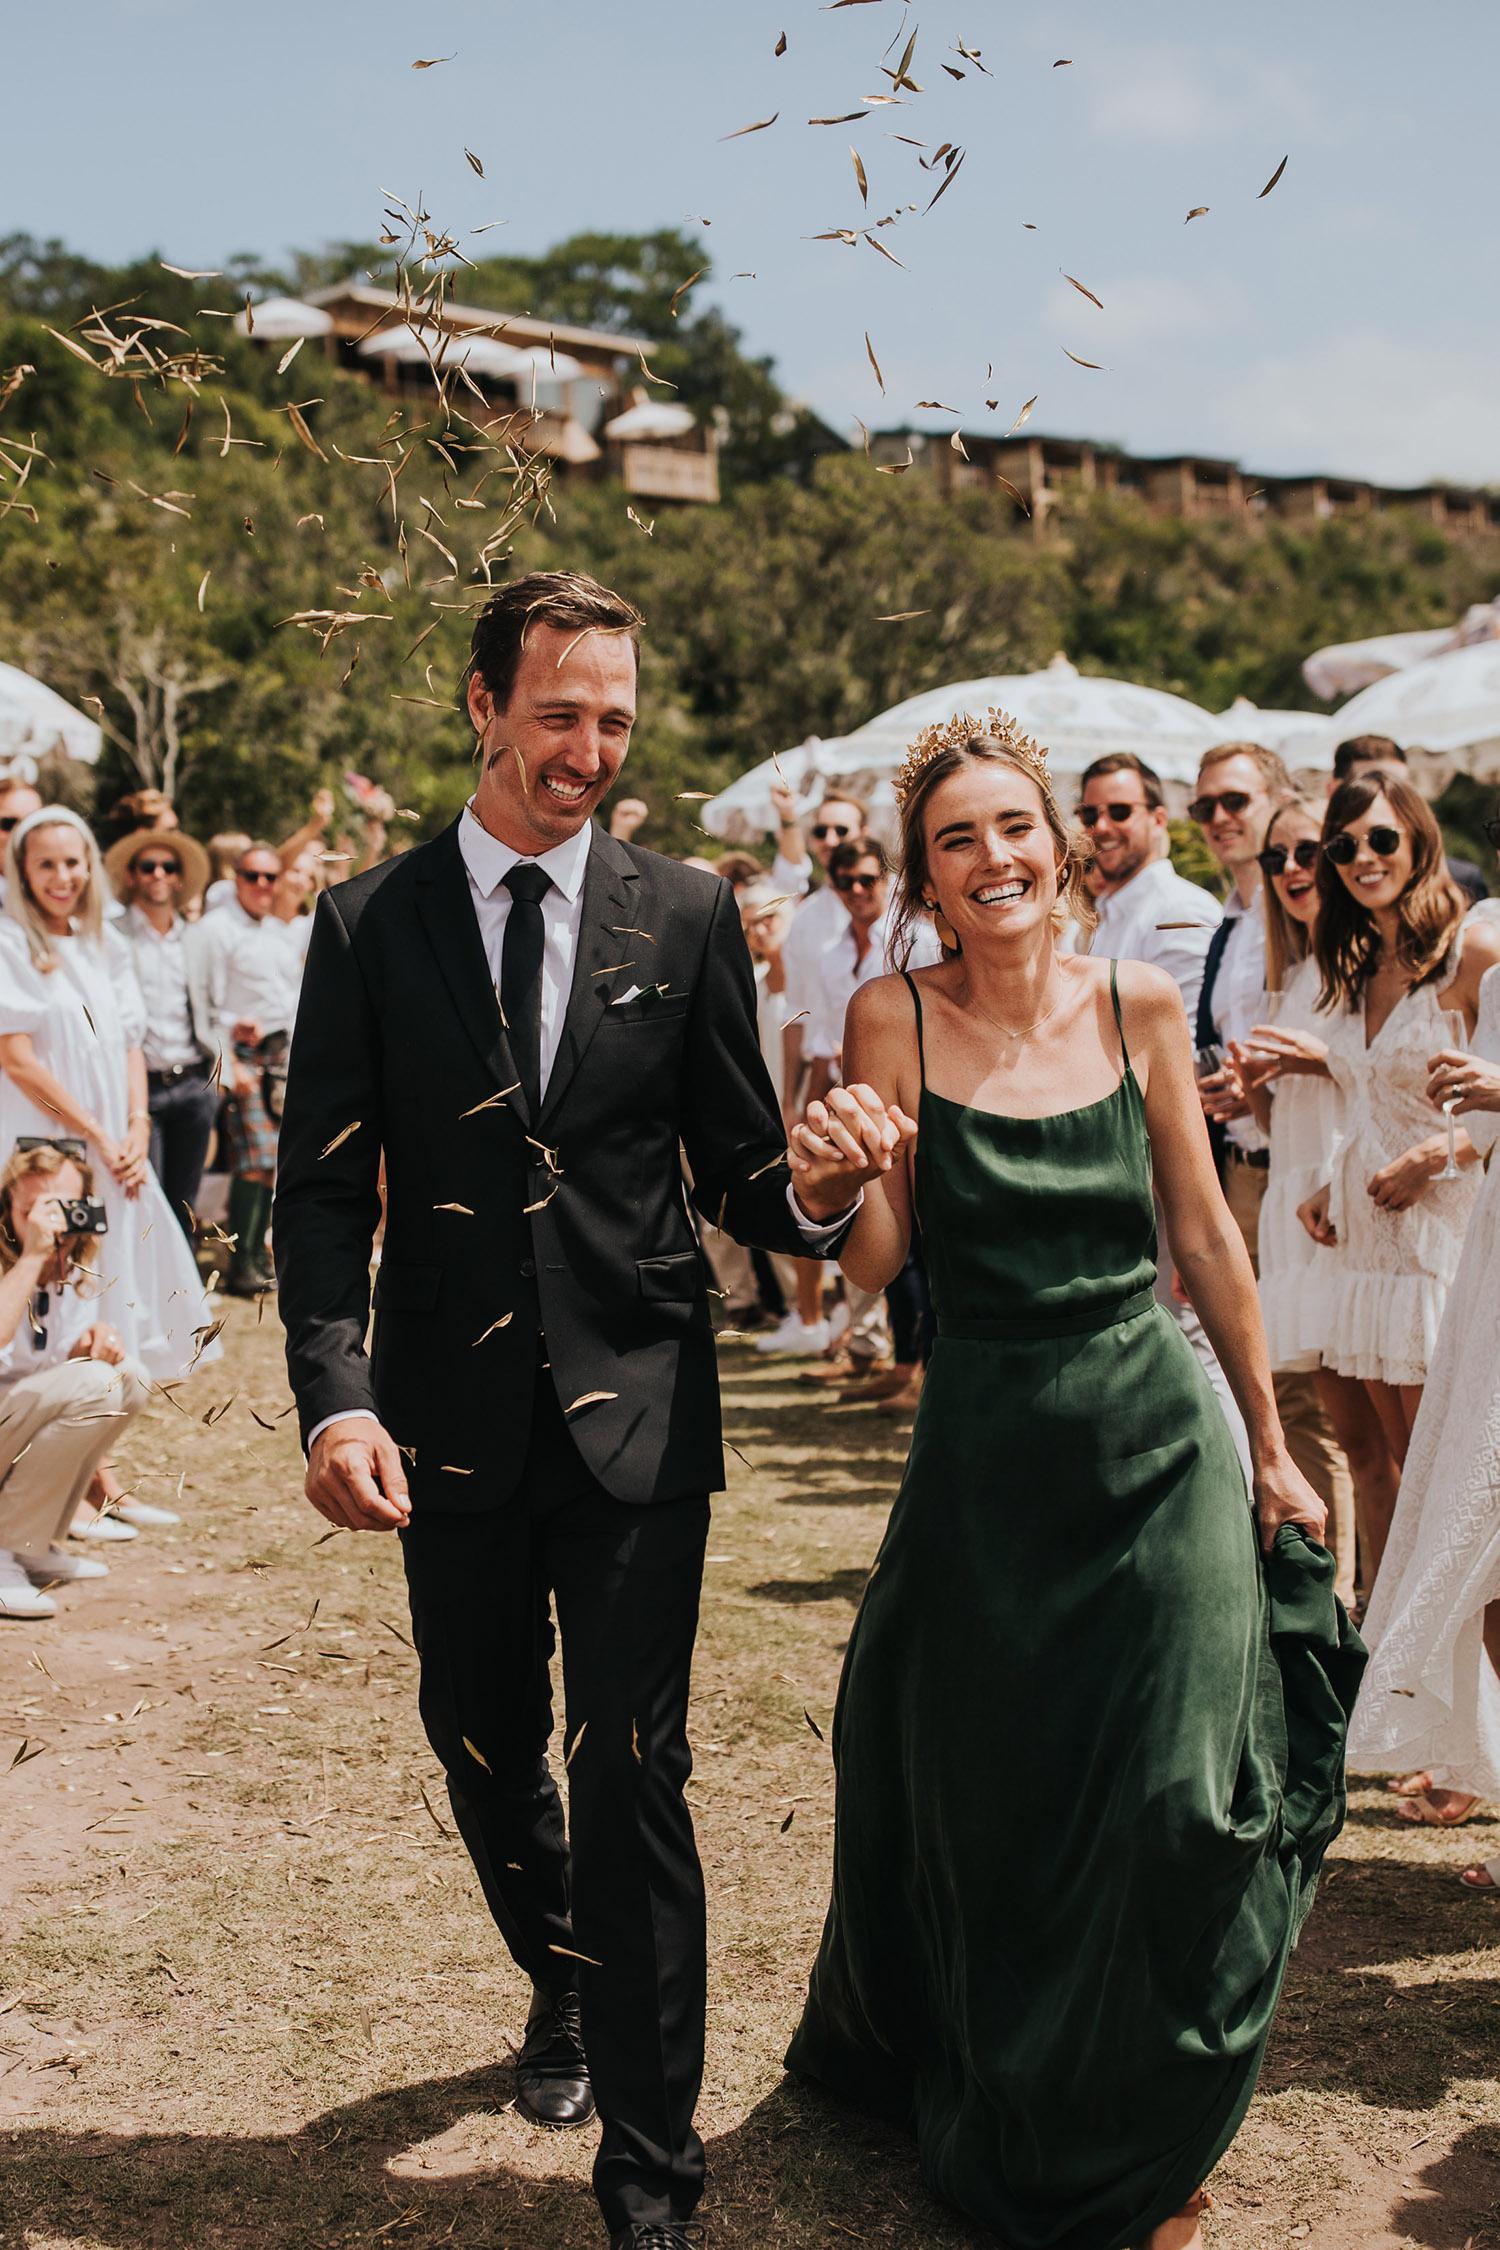 bride in green wedding dress